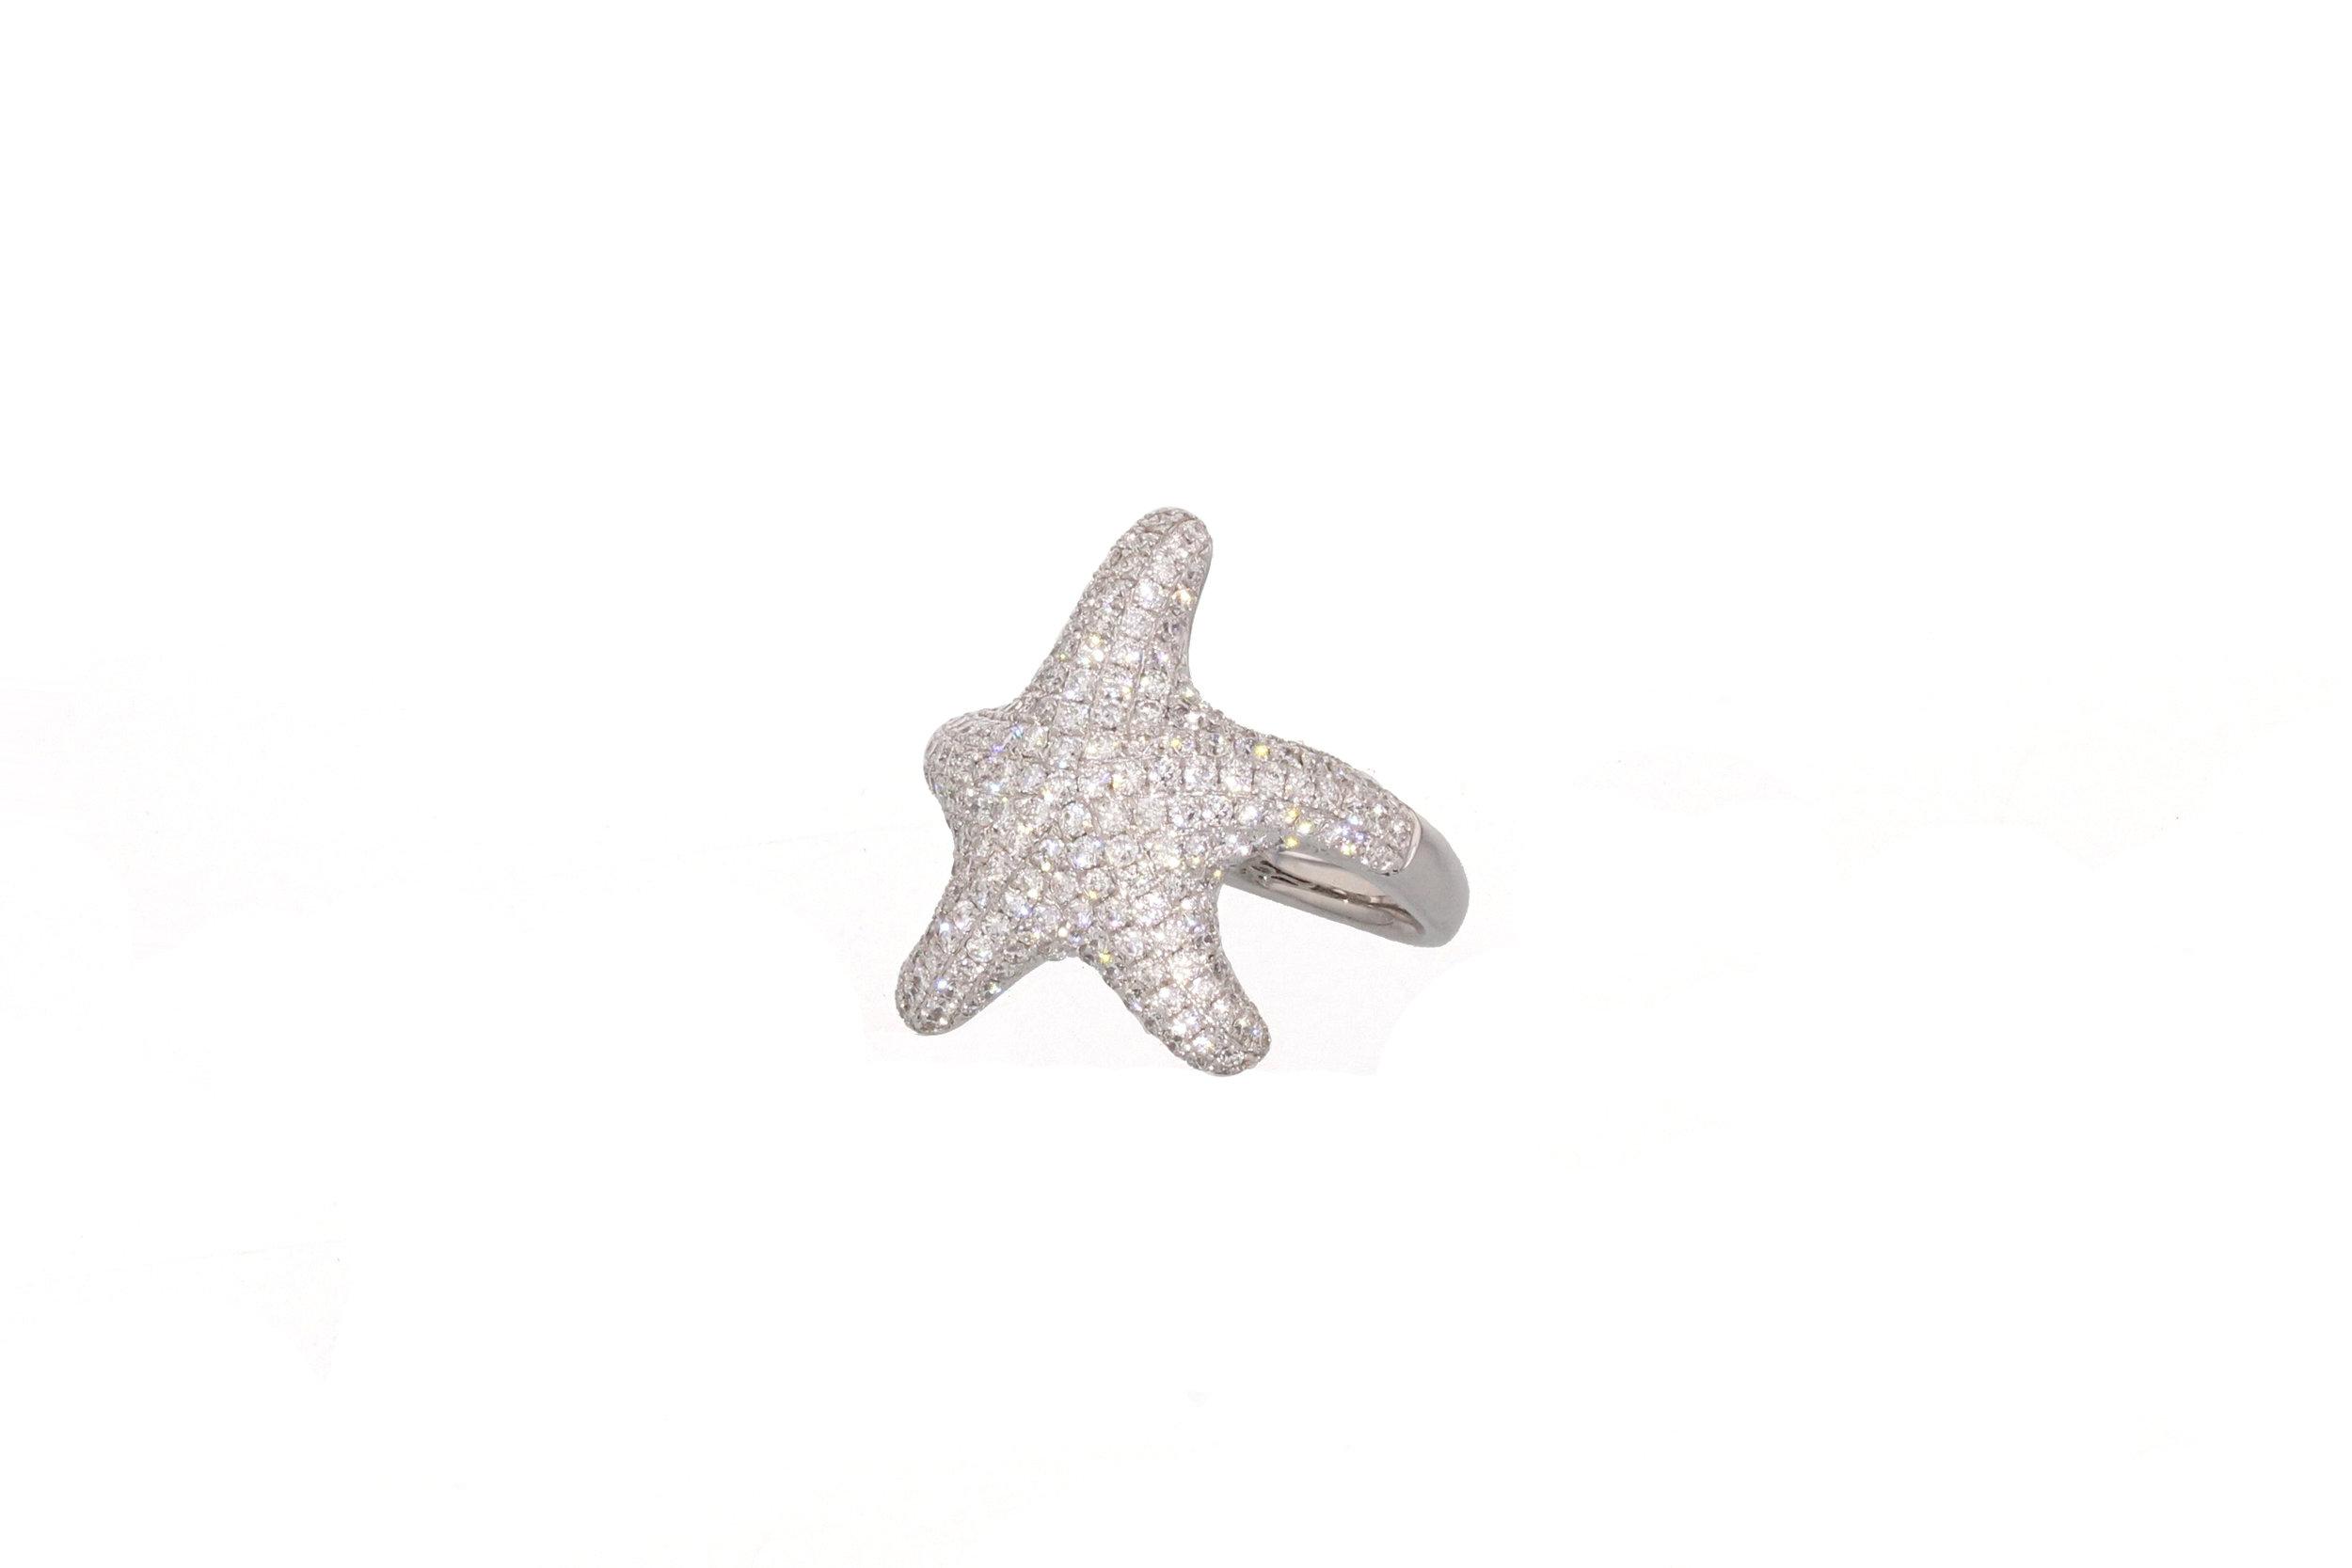 18kt White Gold Diamond Pave Starfish Ring 1.31 tcw. $4500